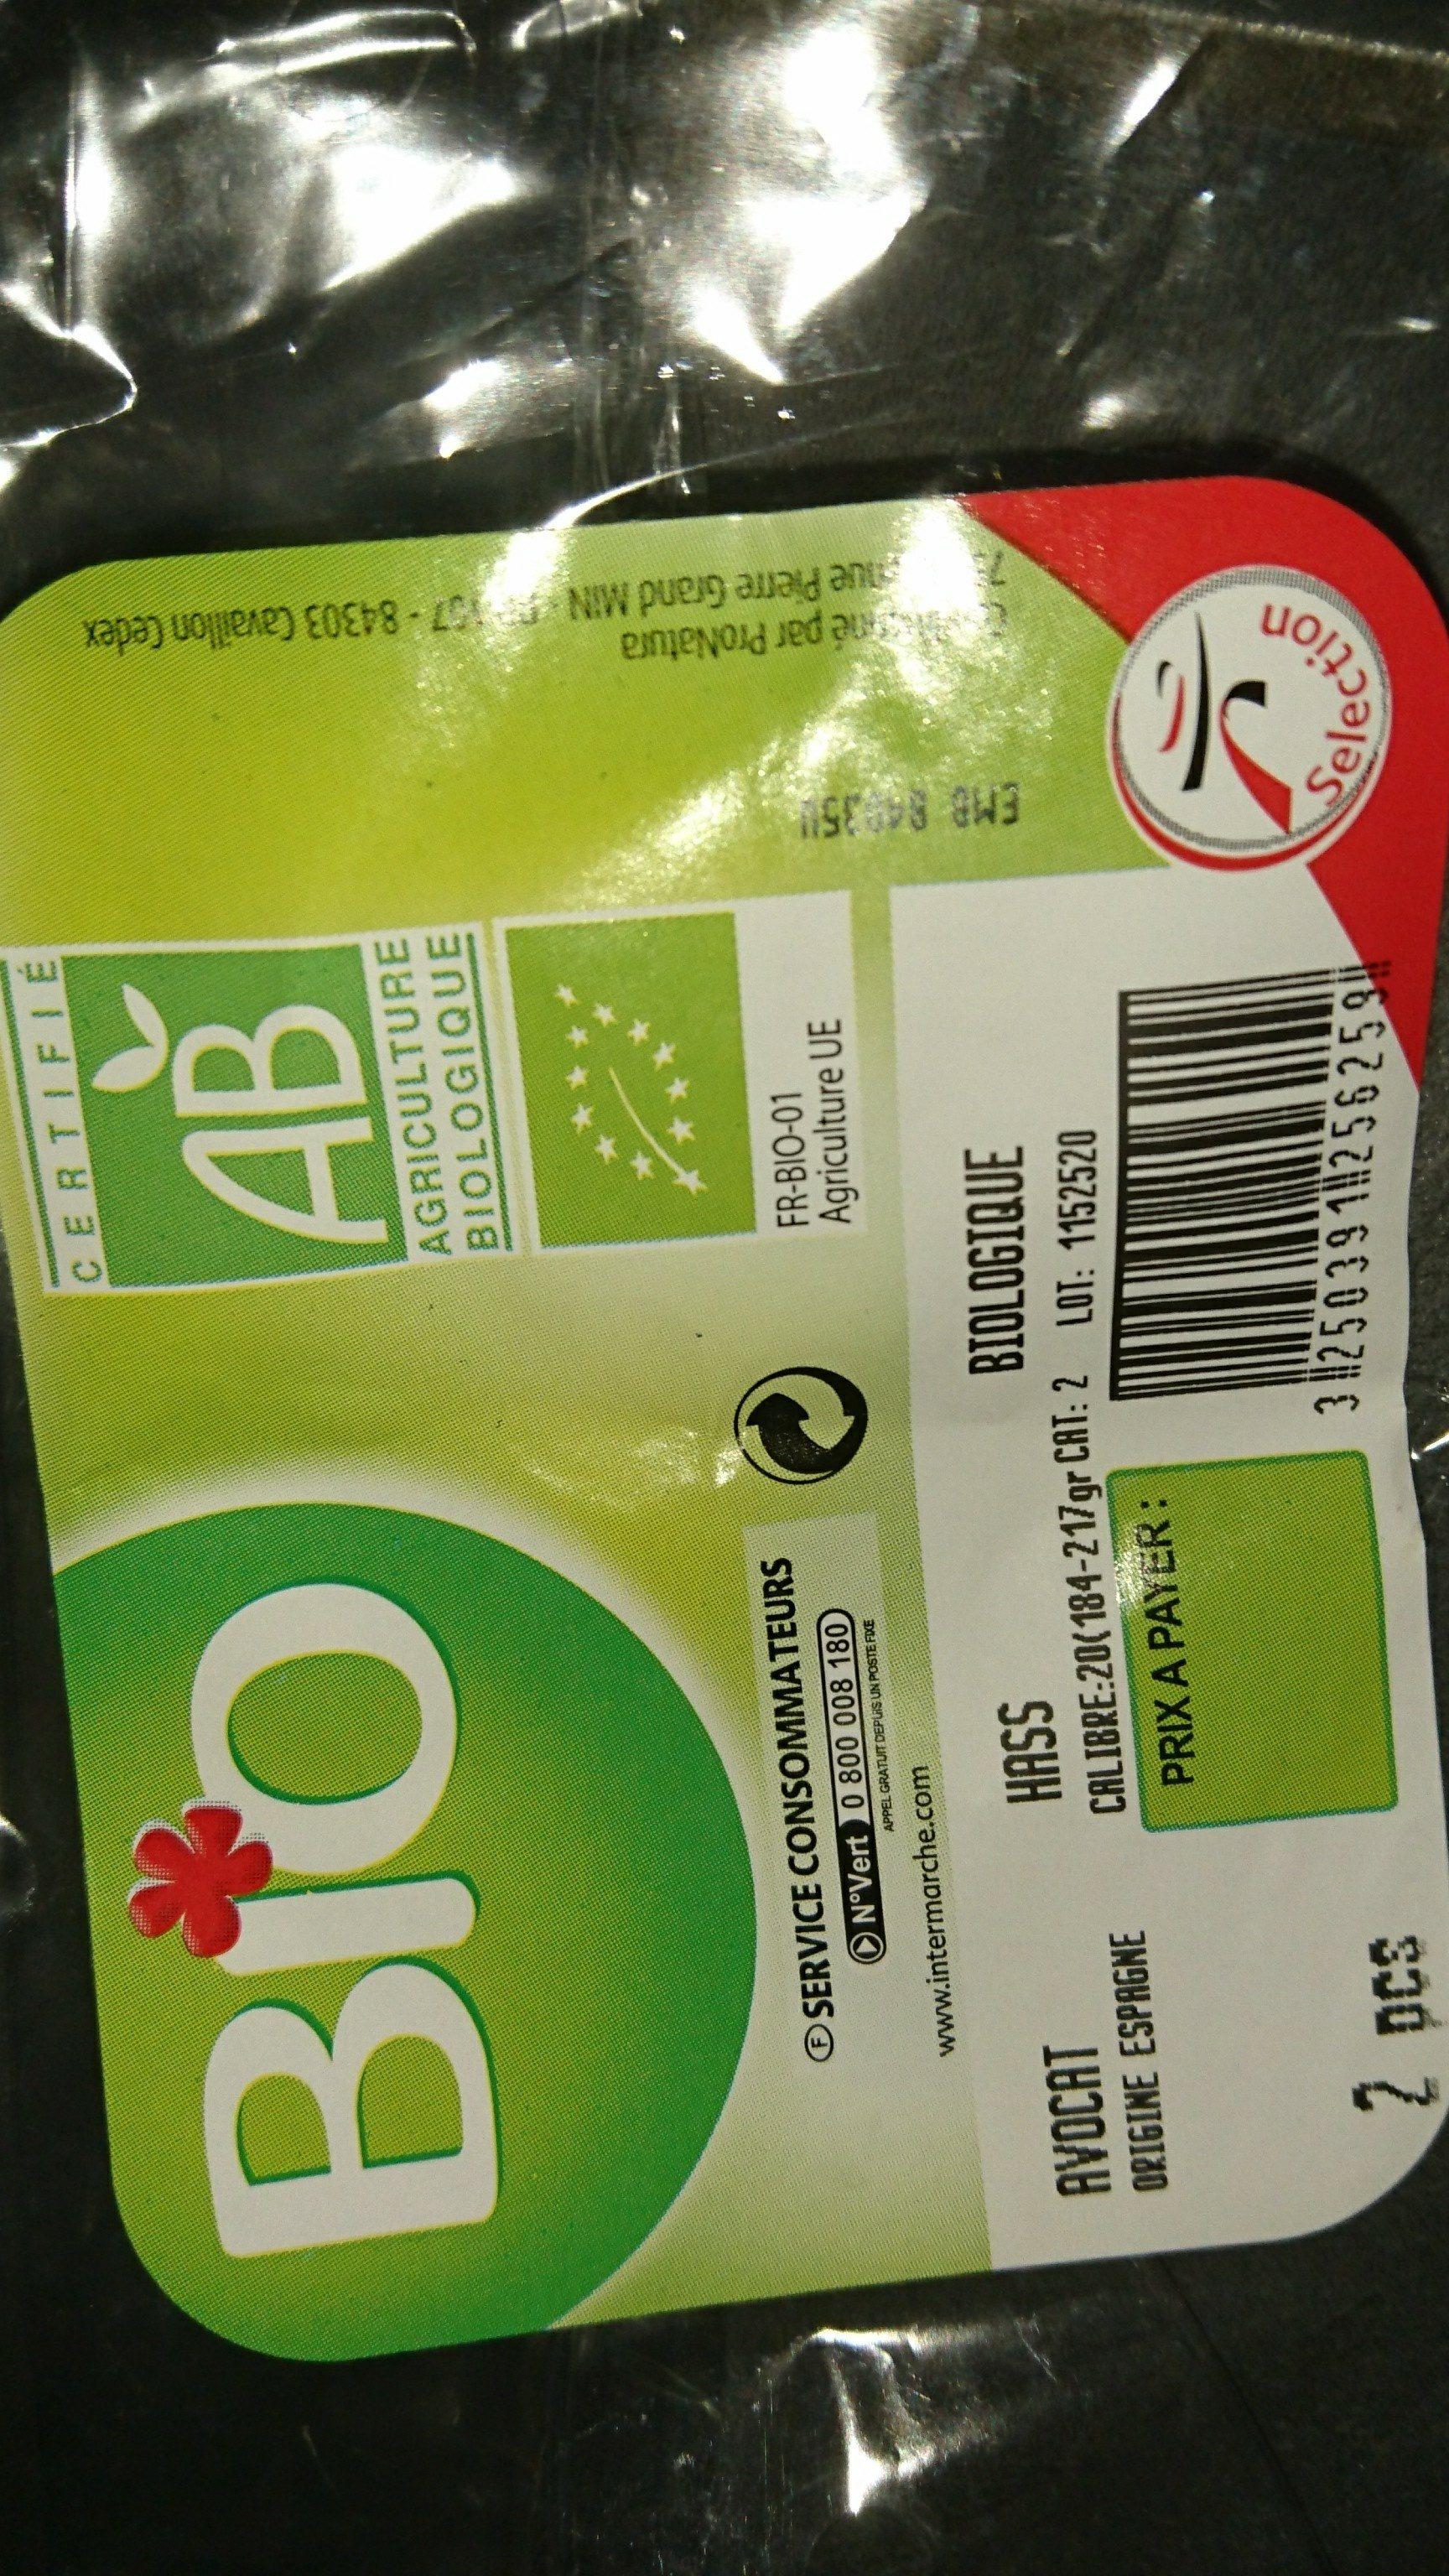 Avocat bio - Ingredients - fr